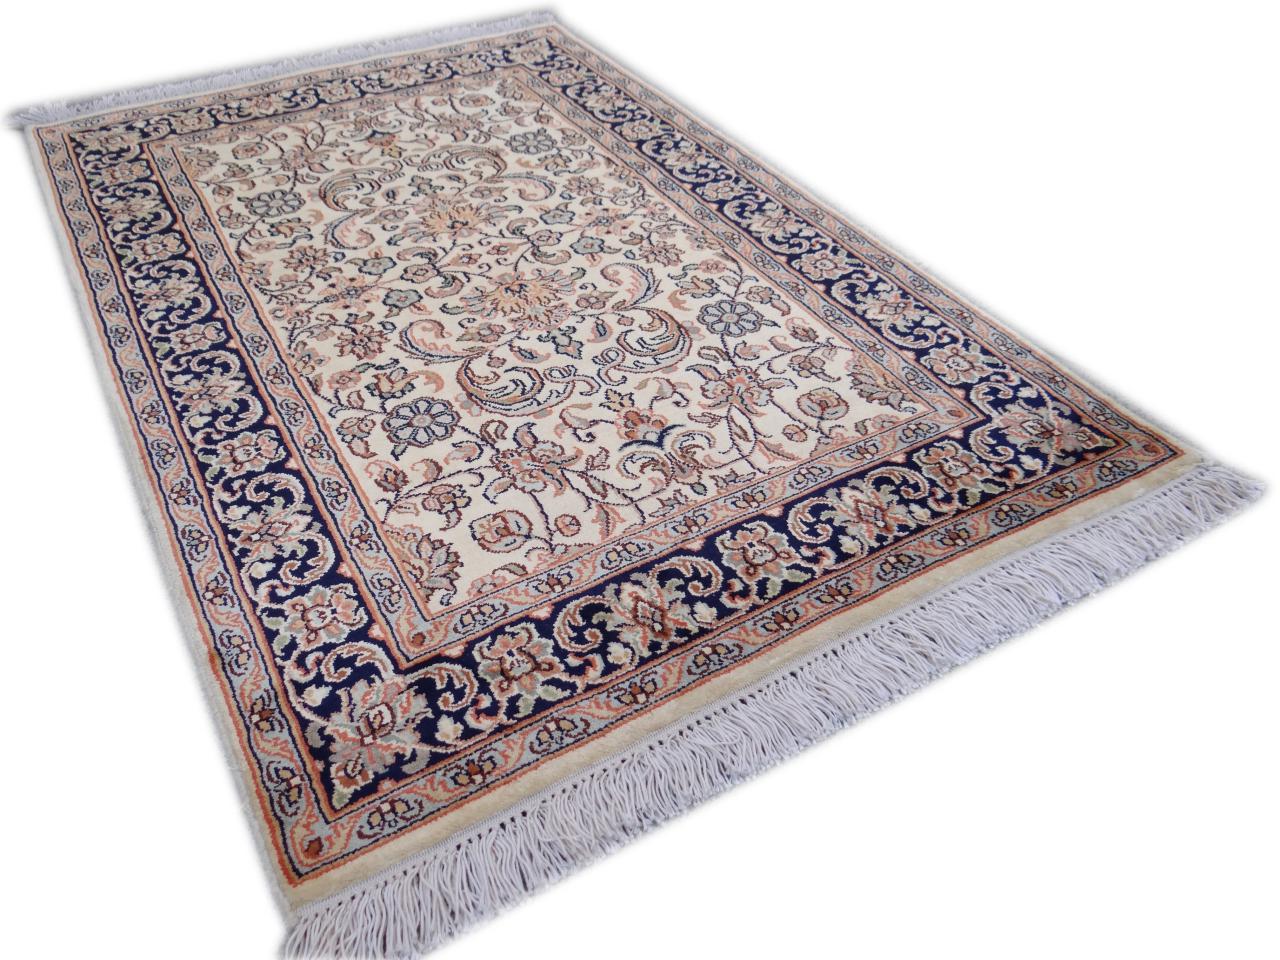 srinagar soie fin tapis prestigieux n 2565 94x61cm. Black Bedroom Furniture Sets. Home Design Ideas